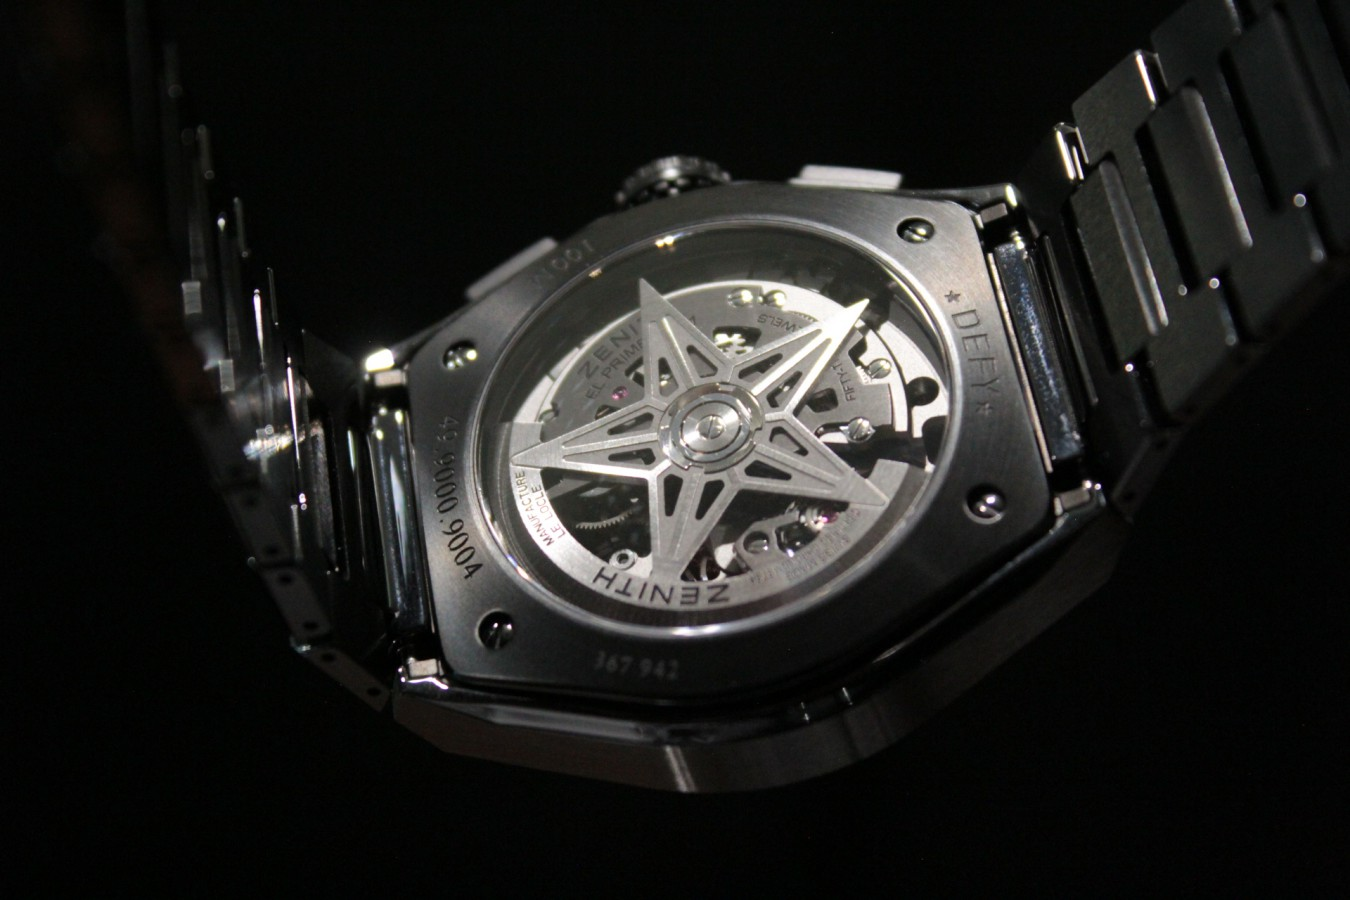 IMG_4173 高級感と使い易さを備えたオールブラックモデル【デファイ エル・プリメロ21】 - DEFY